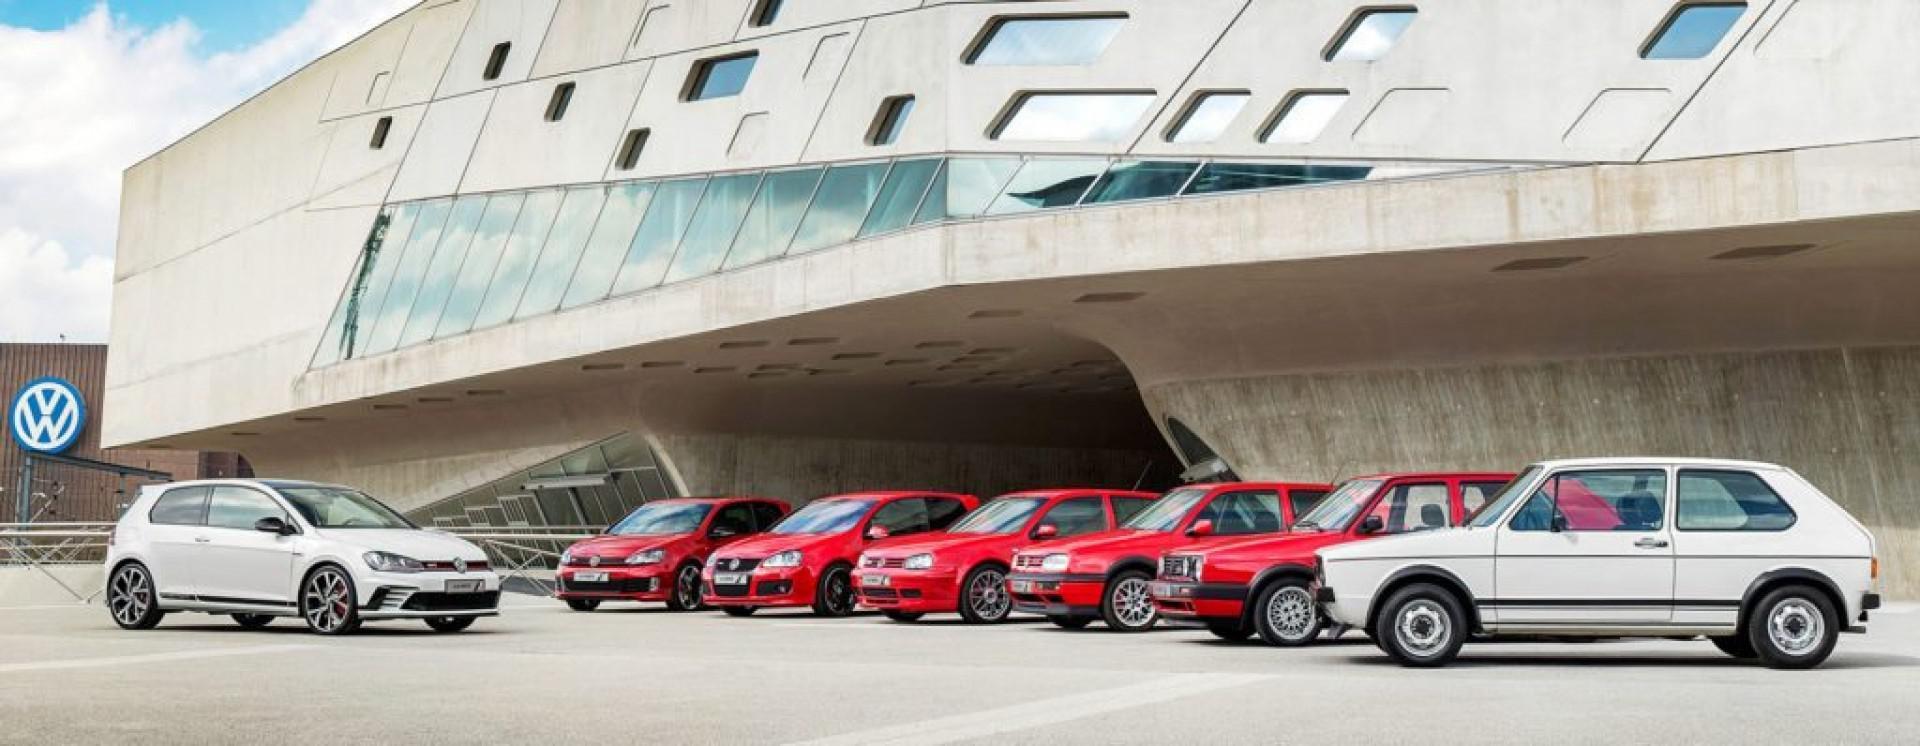 Evolution Rapport poids/puissance : Dossier VW Golf